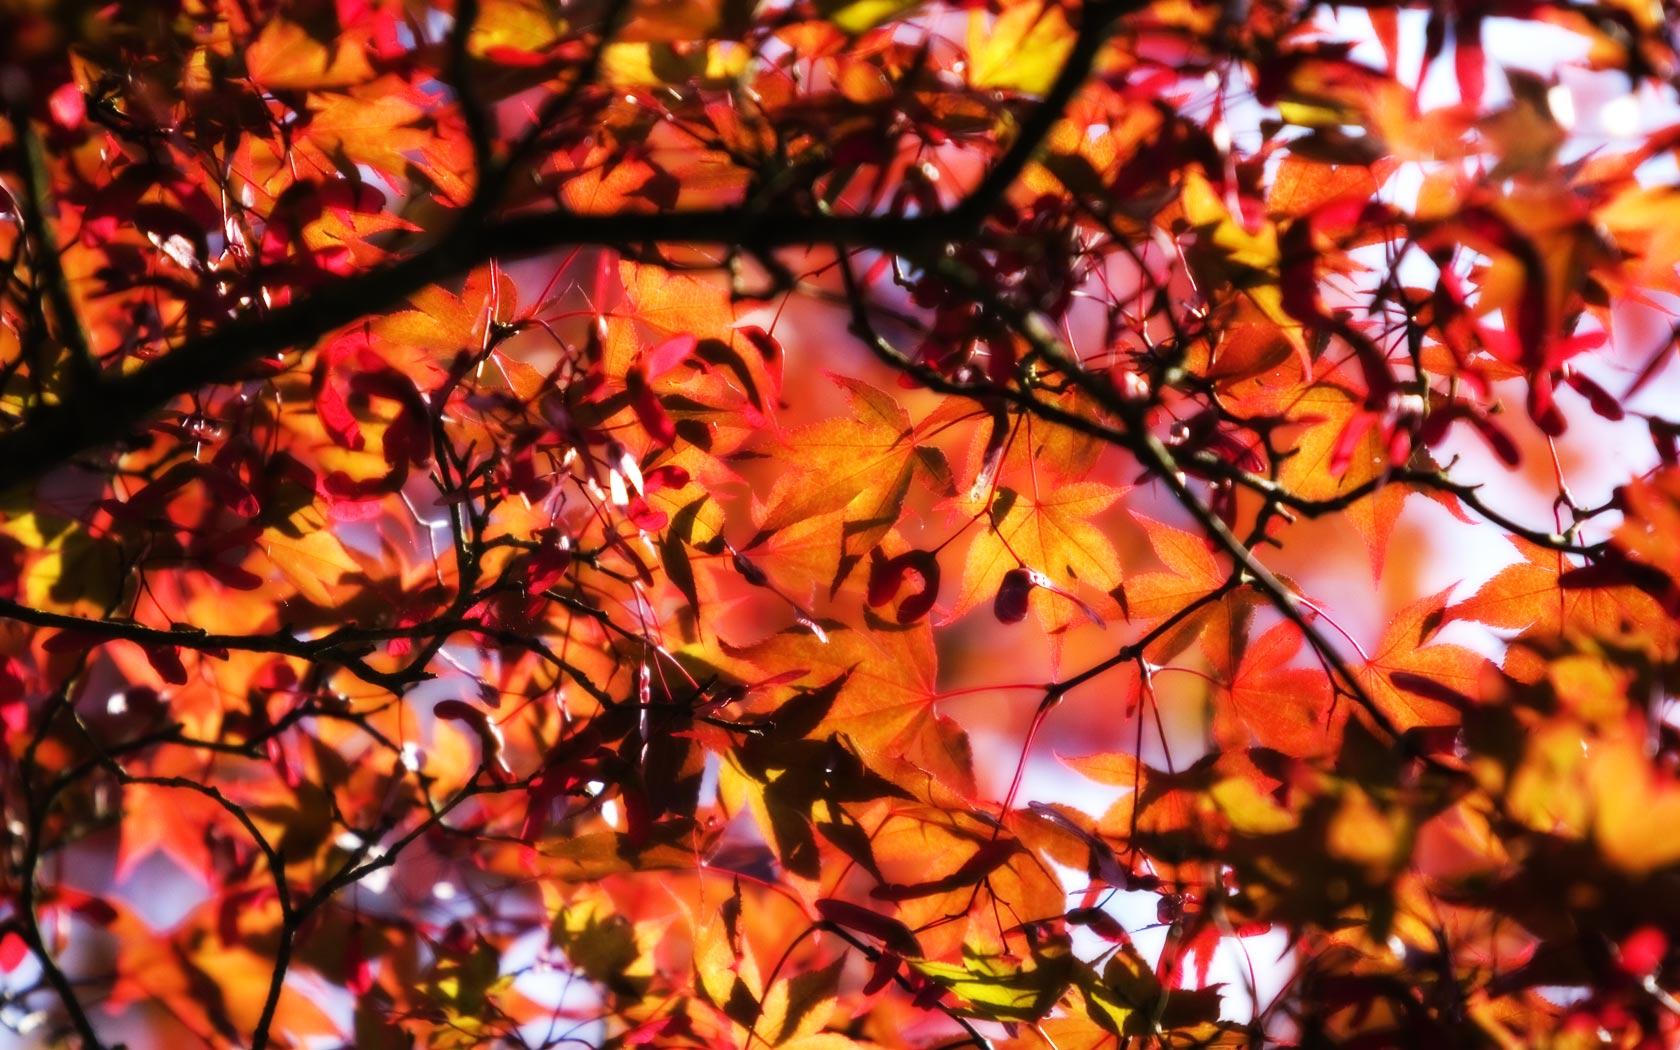 Fall Leaves Wallpapers for Desktop wallpaper wallpaper hd 1680x1050